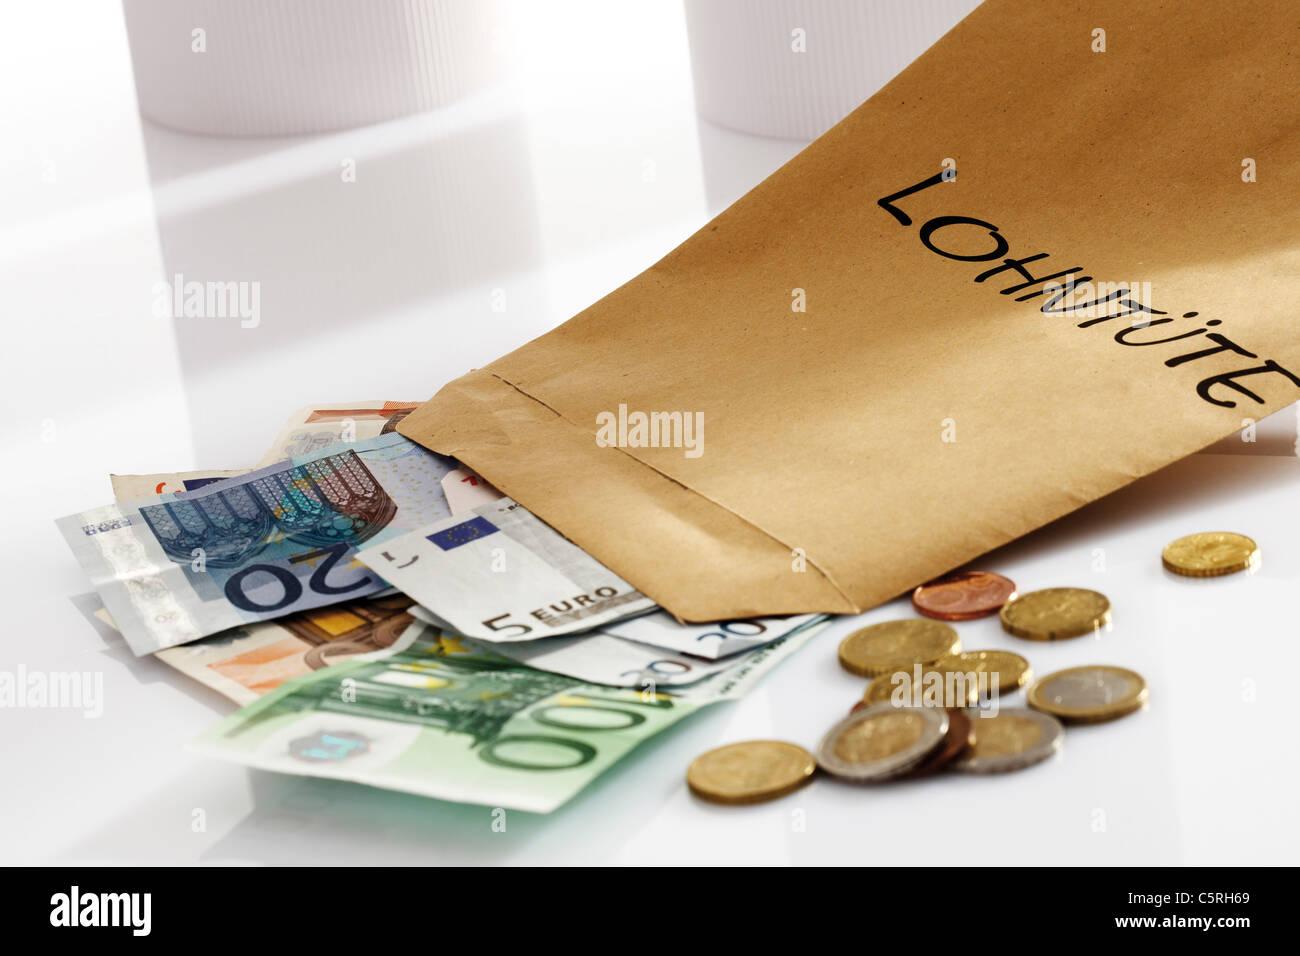 Wage packet, Euro coins and Euro bank notes, close-up - Stock Image